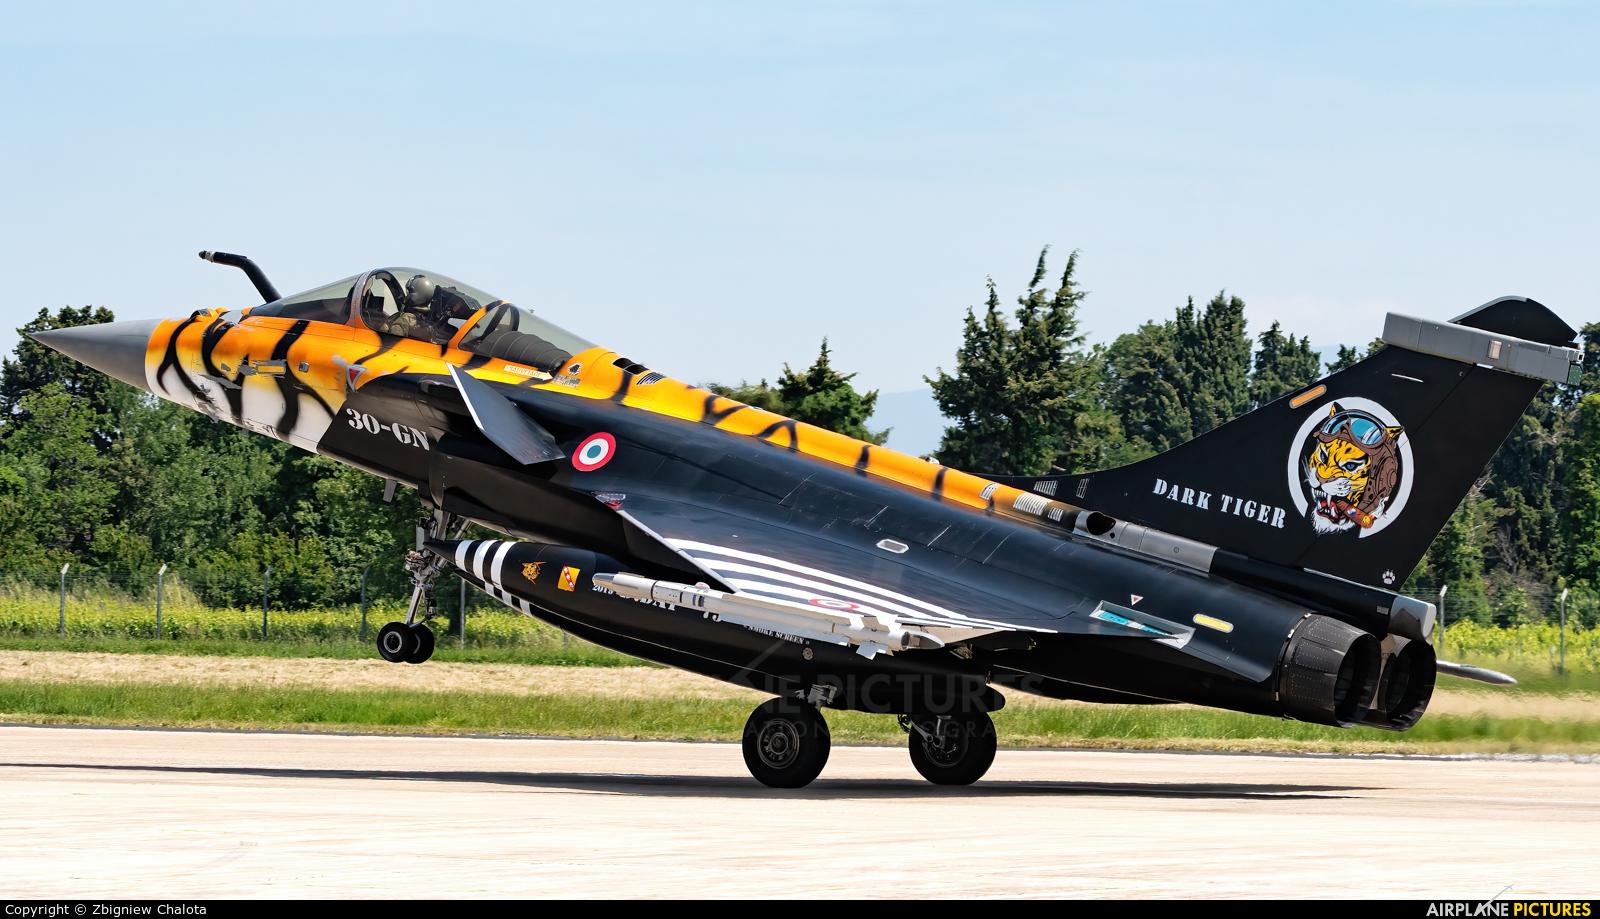 France - Air Force 30-GN aircraft at Orange - Caritat